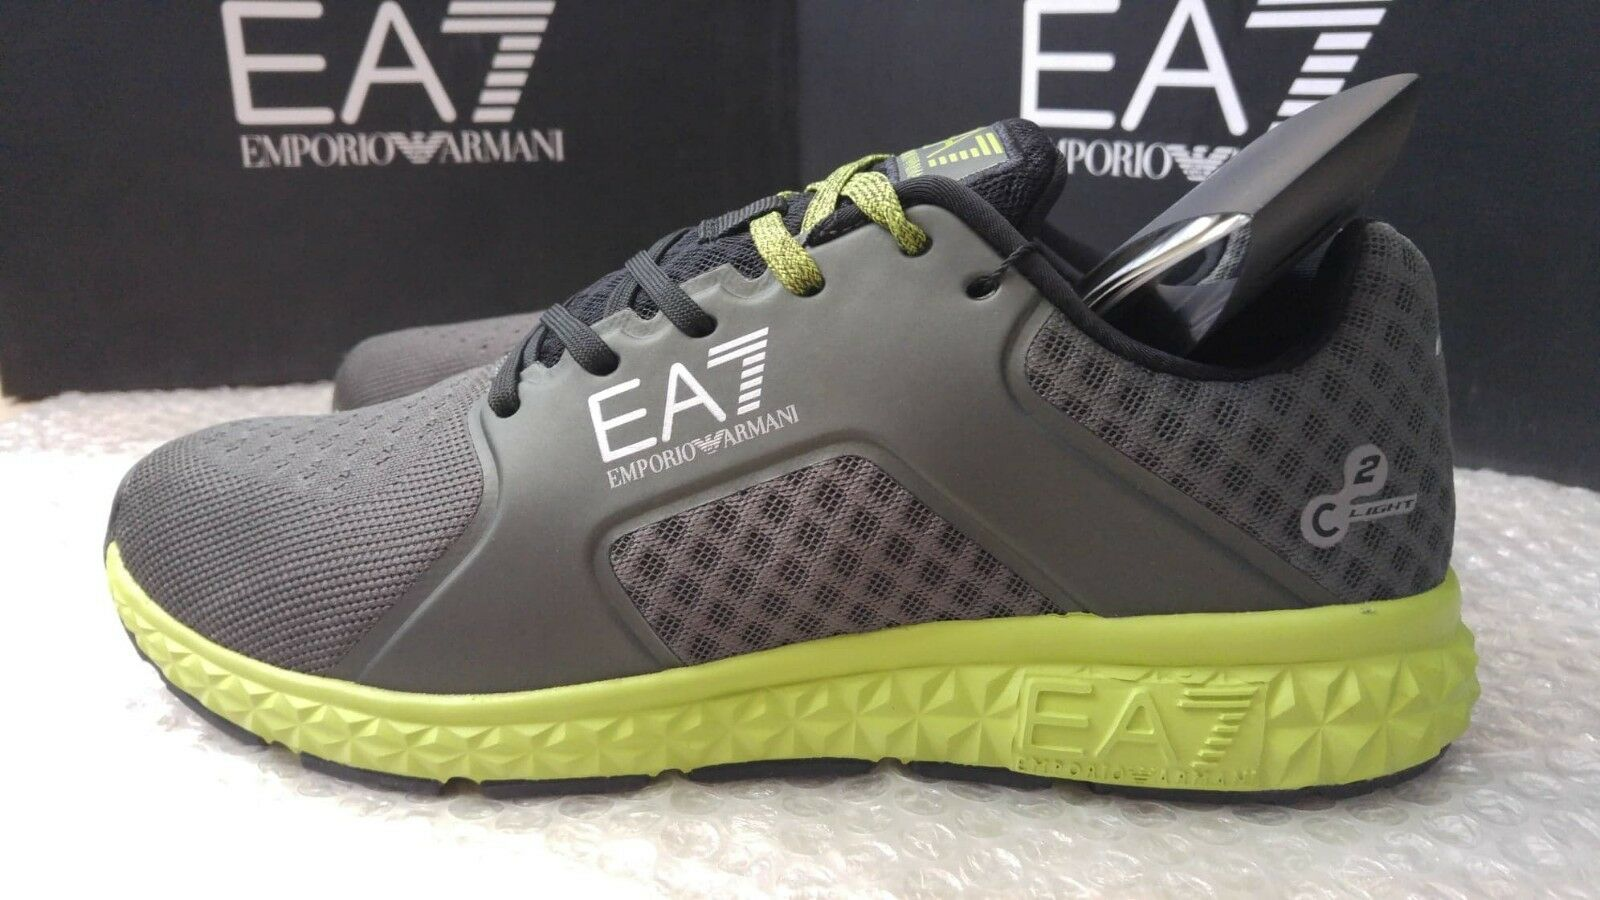 Emporio Armani EA7 men's spirit light trainers size 9UK(43) 9UK(43) size - Memory Foam Insole 256f4d